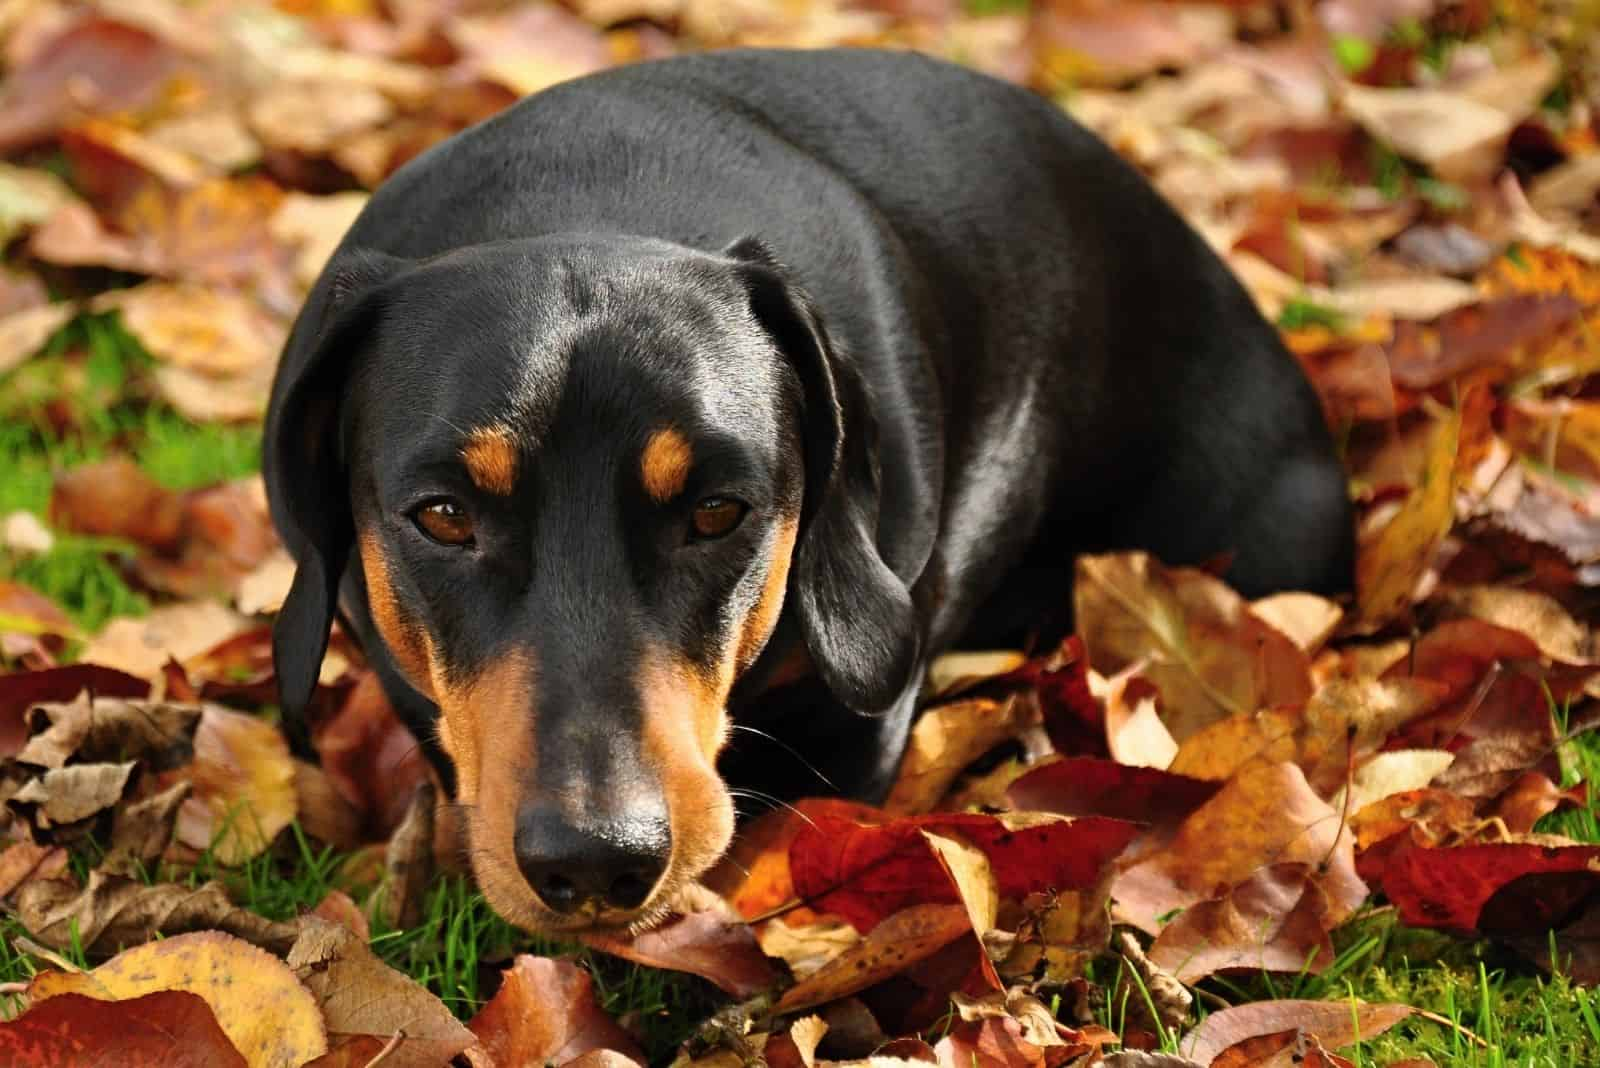 little black dachshund on autumn garden with leaves